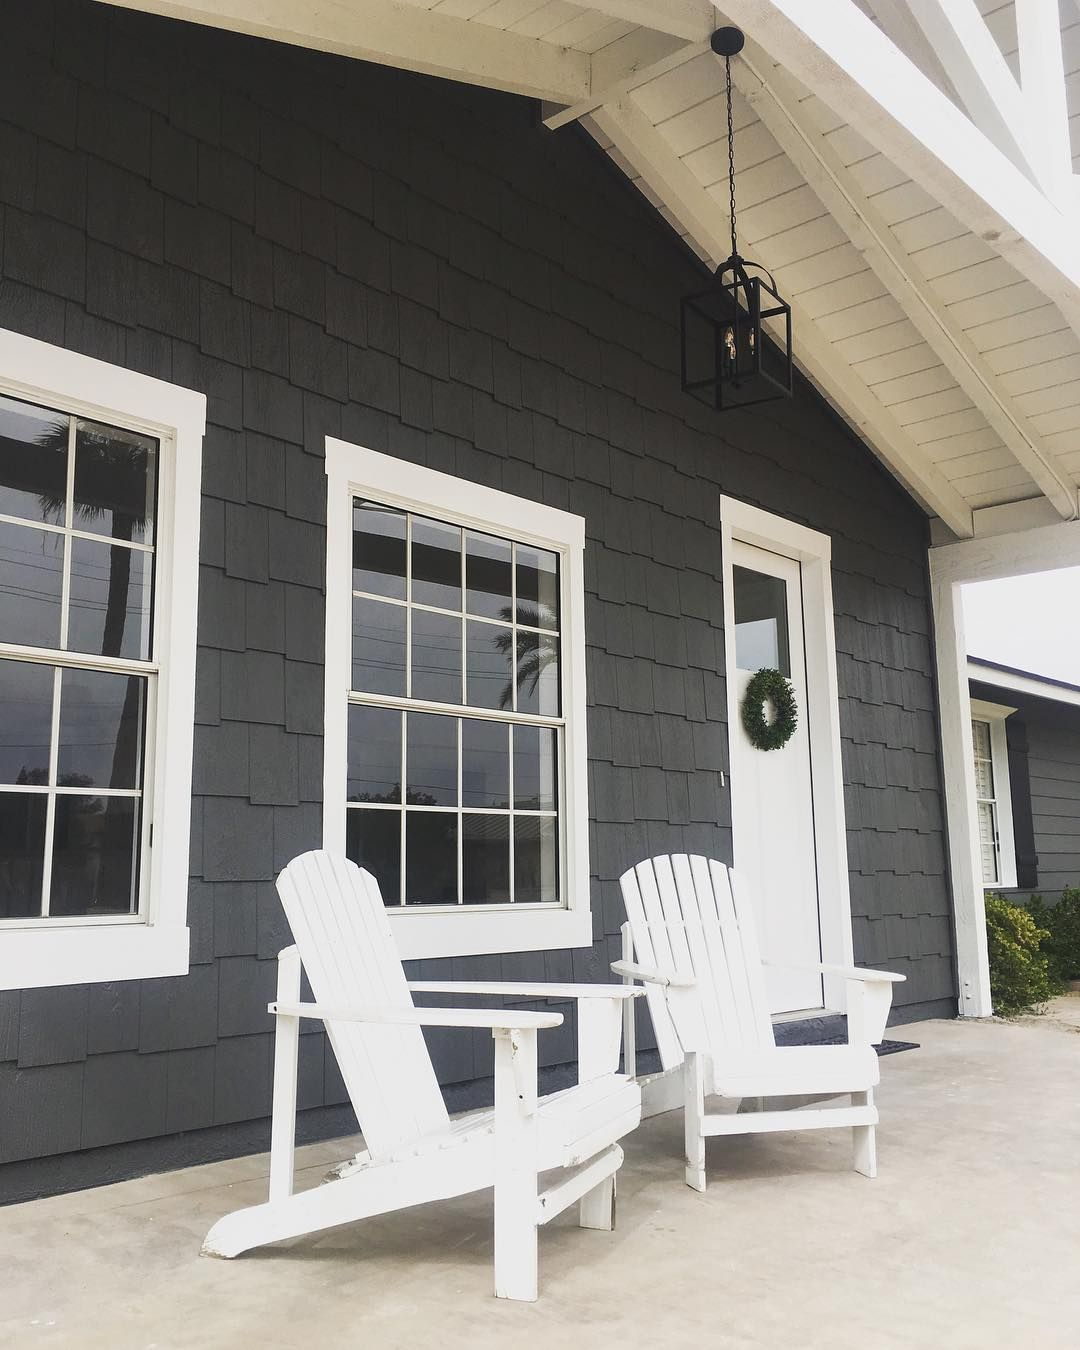 Top 6 dunn edwards paint colors for 2018 paint house - Dunn edwards paint colors exterior ...